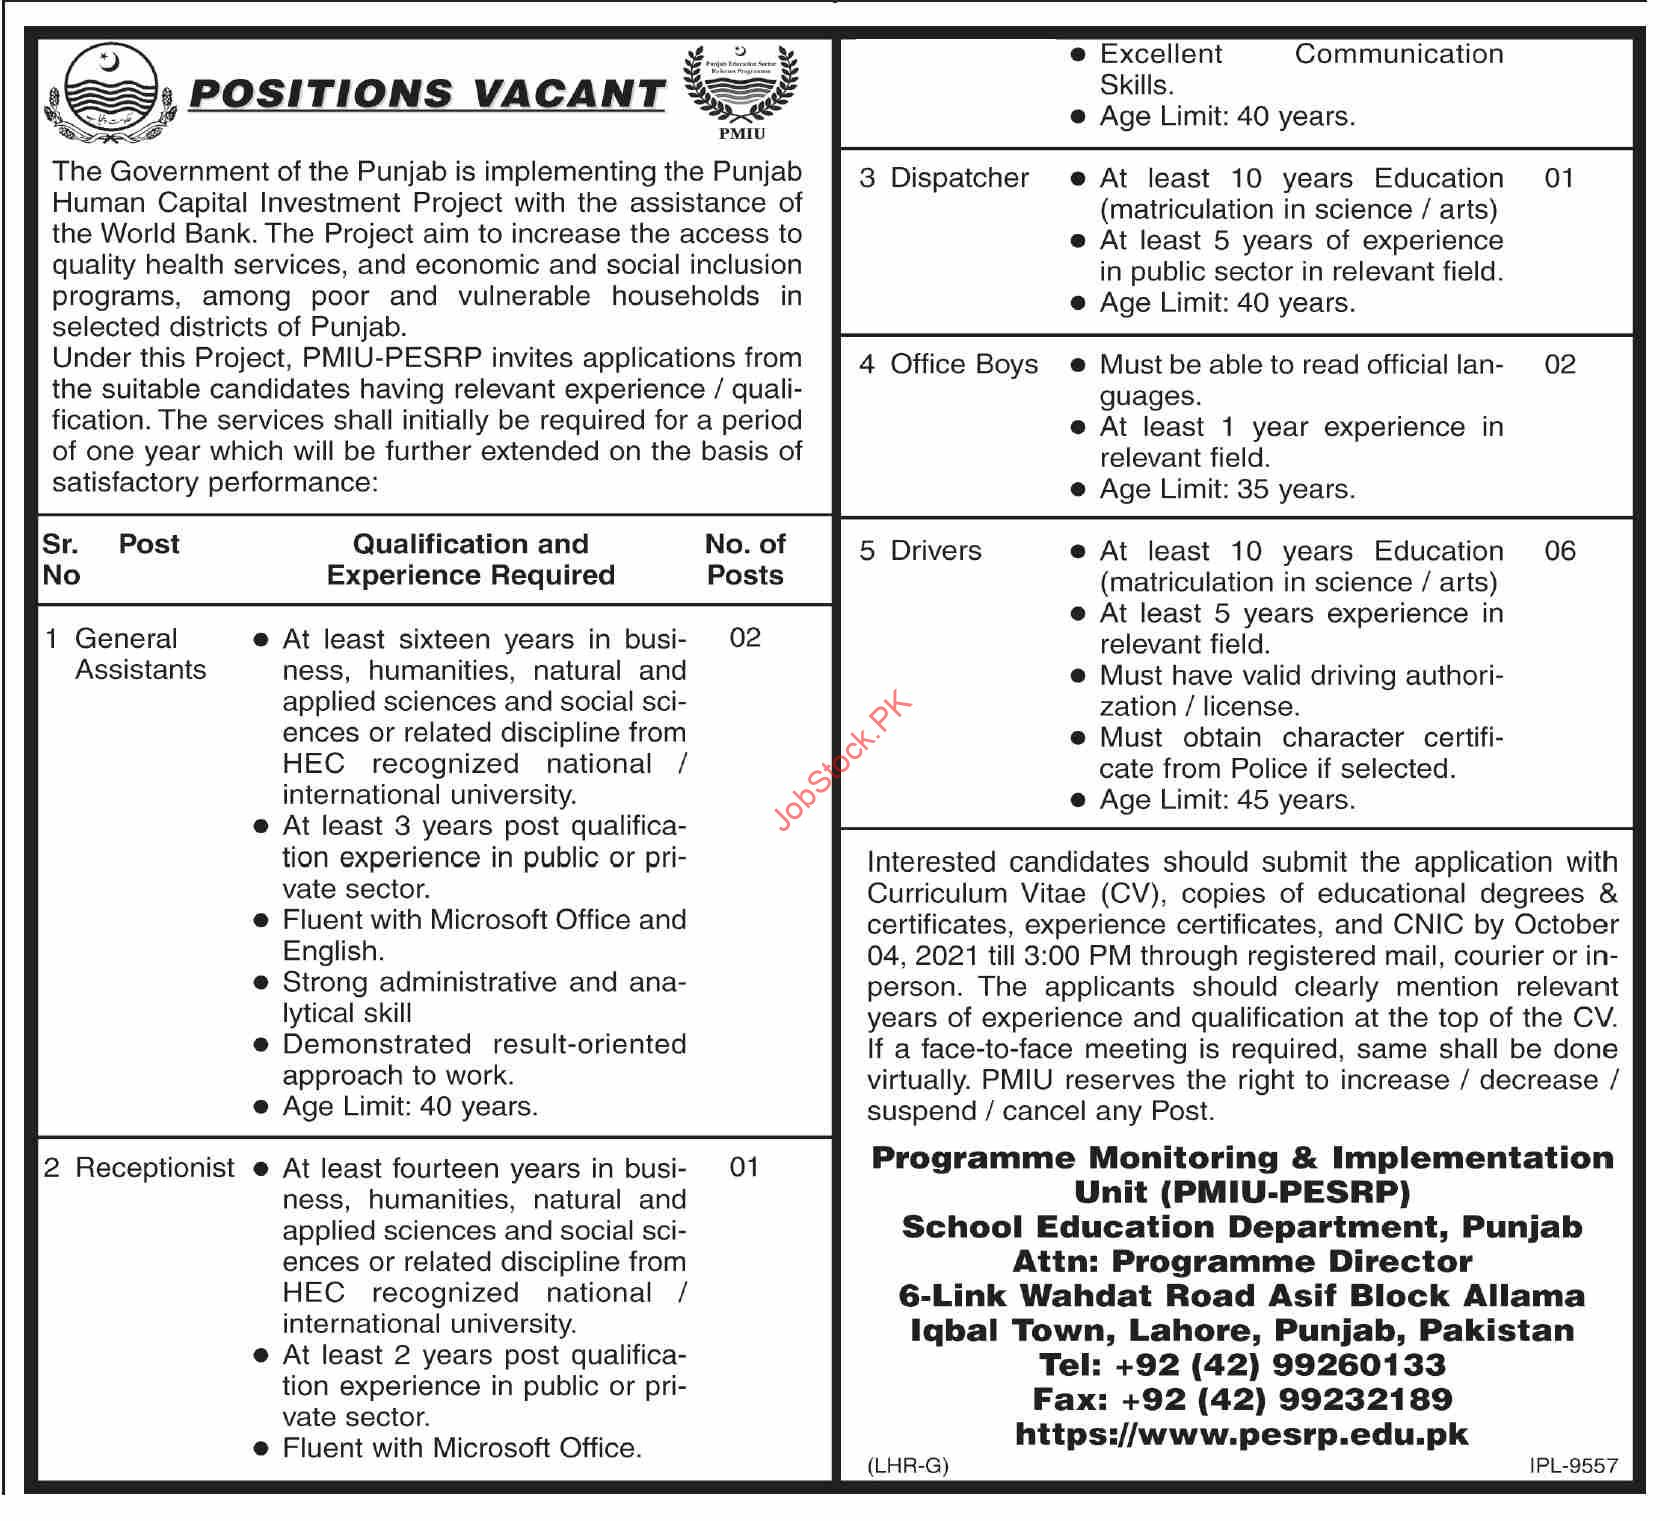 Punjab School Education Department Pmiu Jobs 2021 Application Form